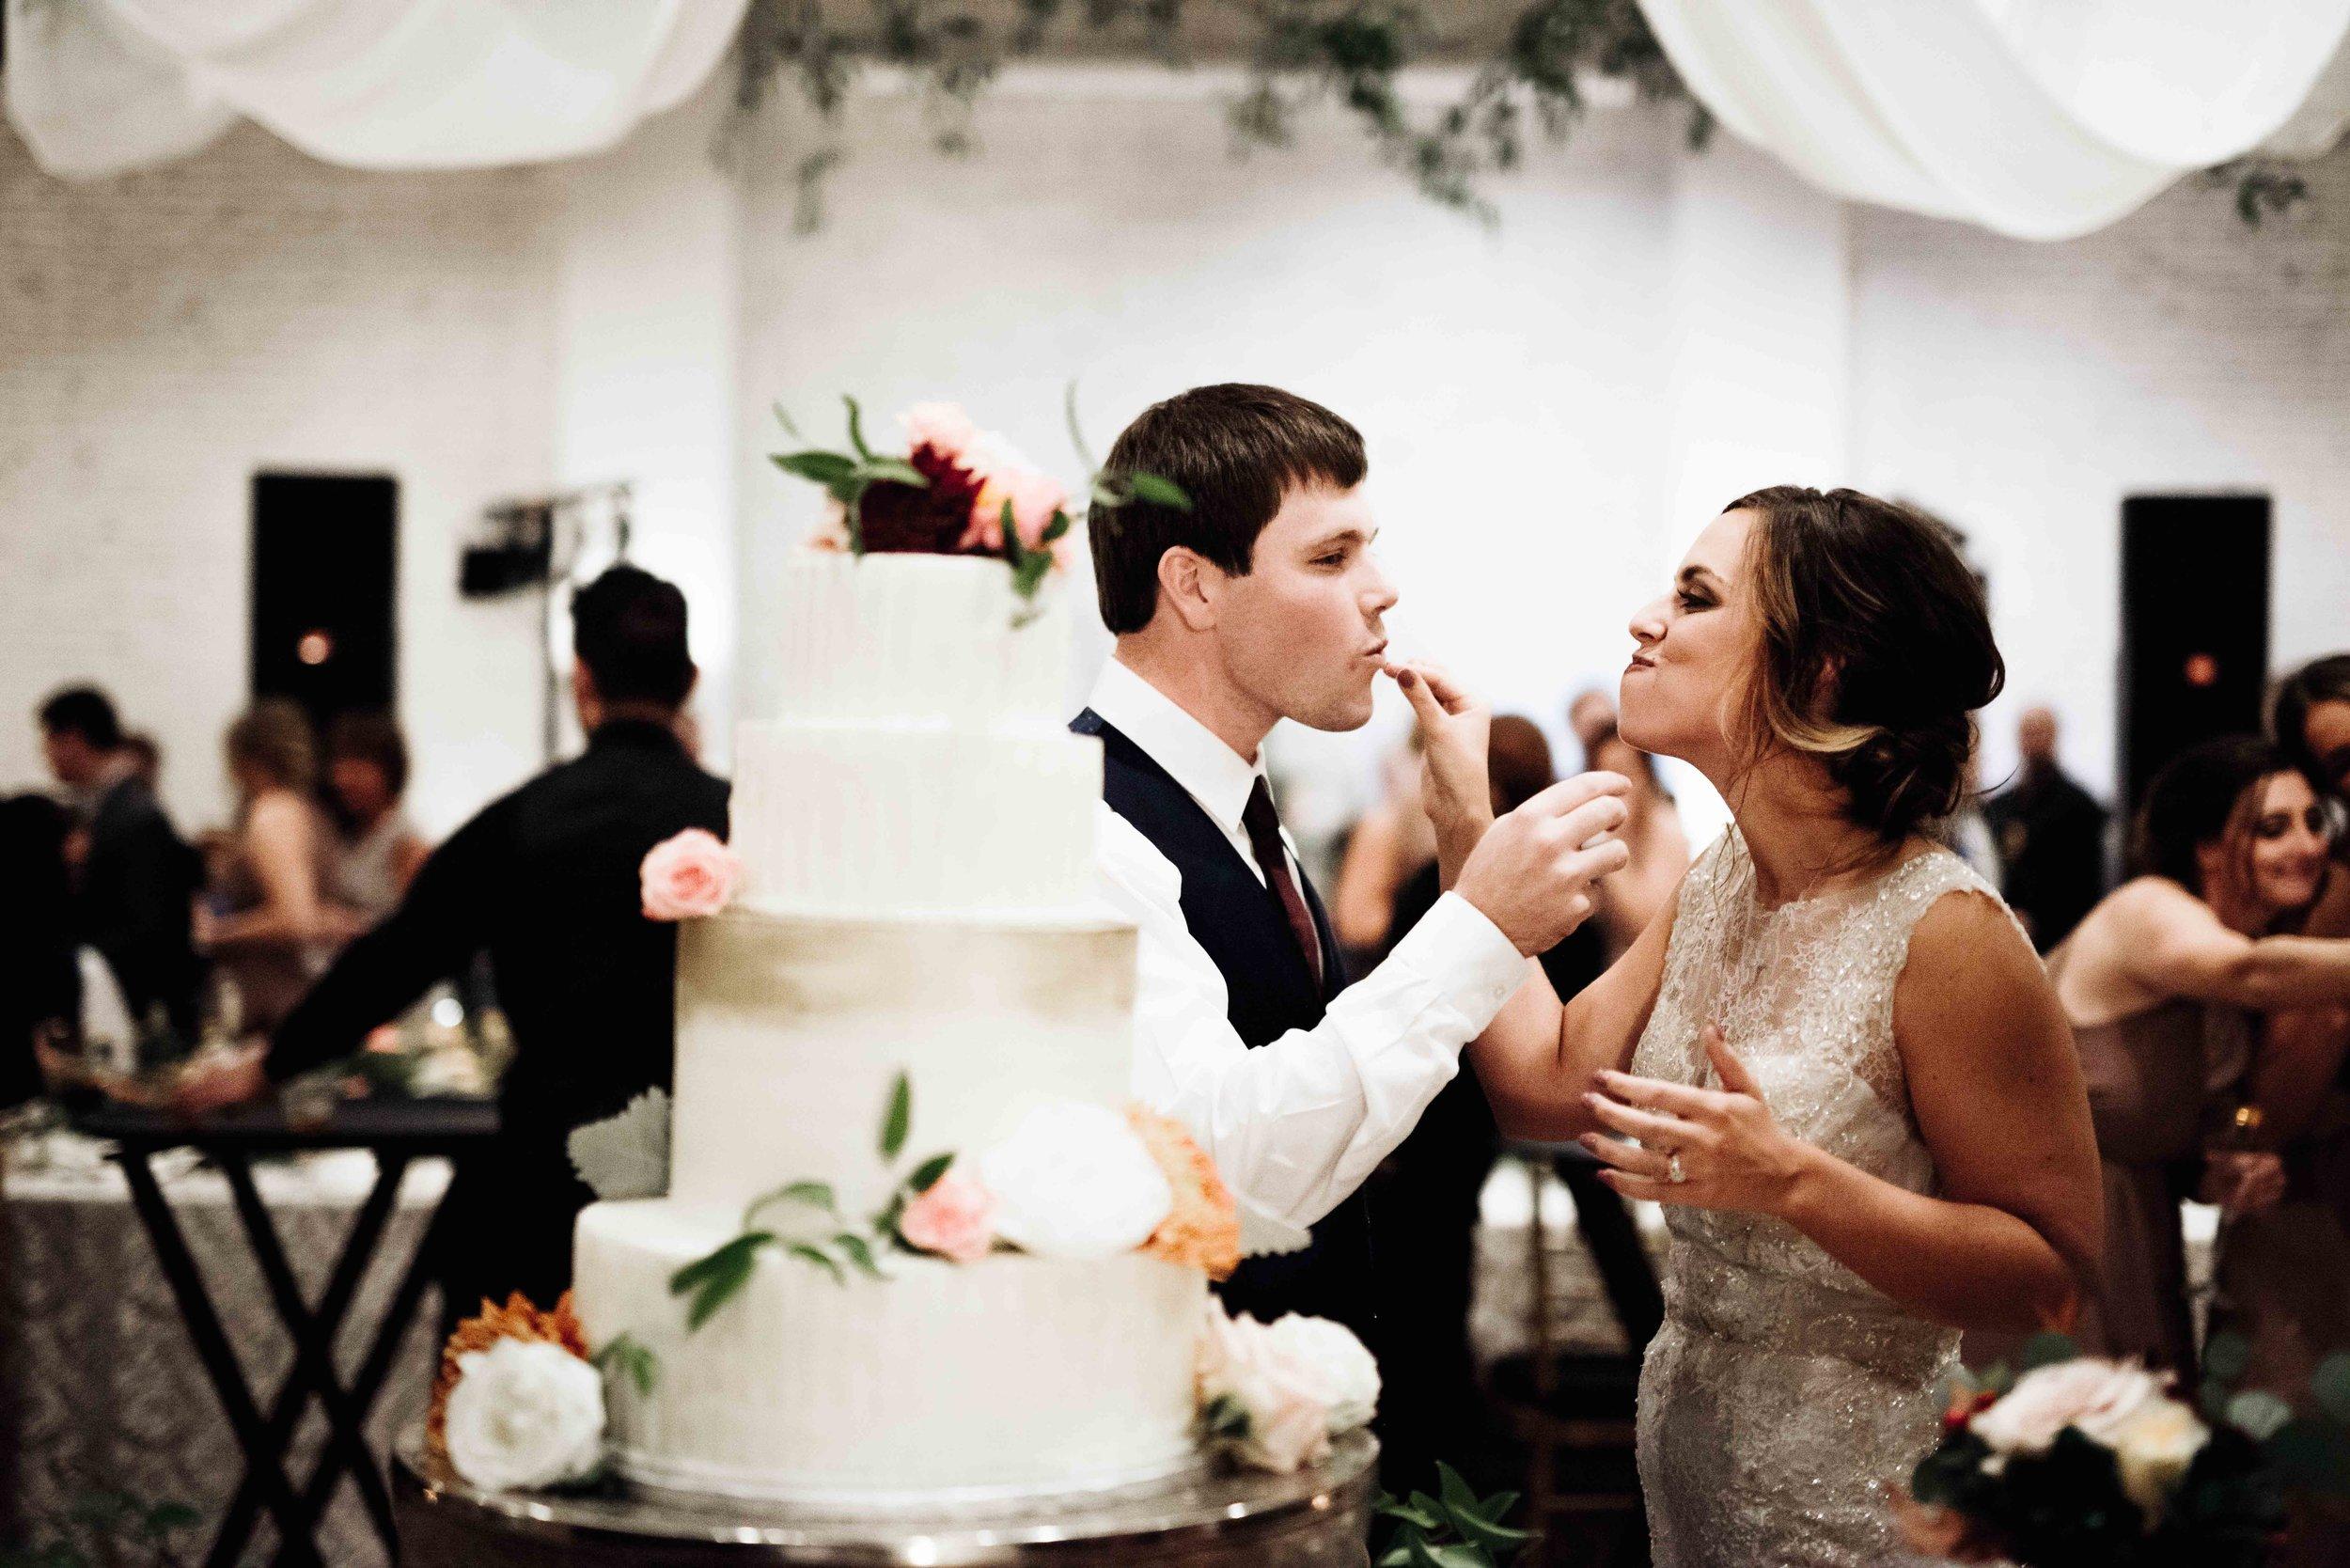 Carlee-Bob-Indianapolis-Wedding-Blog-113.jpg